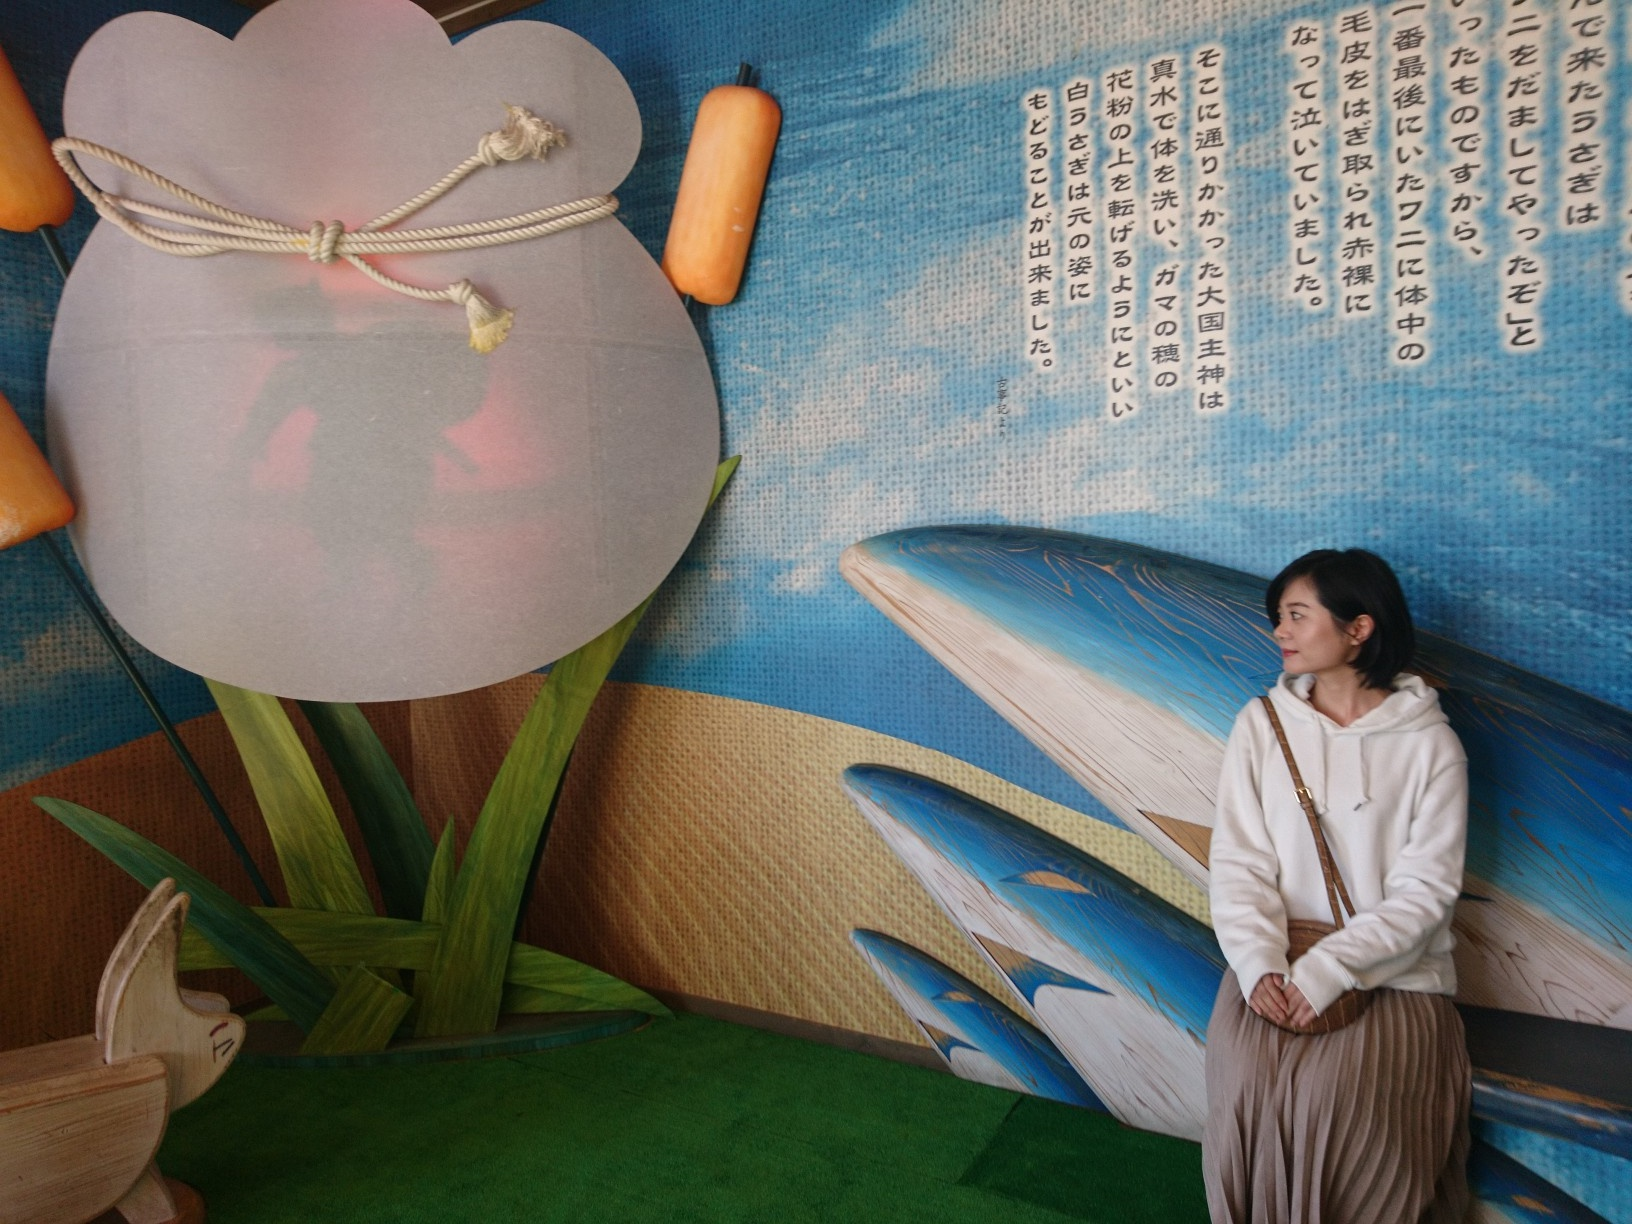 ≪関西・日帰り旅行≫鳥取旅 最後は神話&恋人の聖地で健康・良縁祈願☆ _1